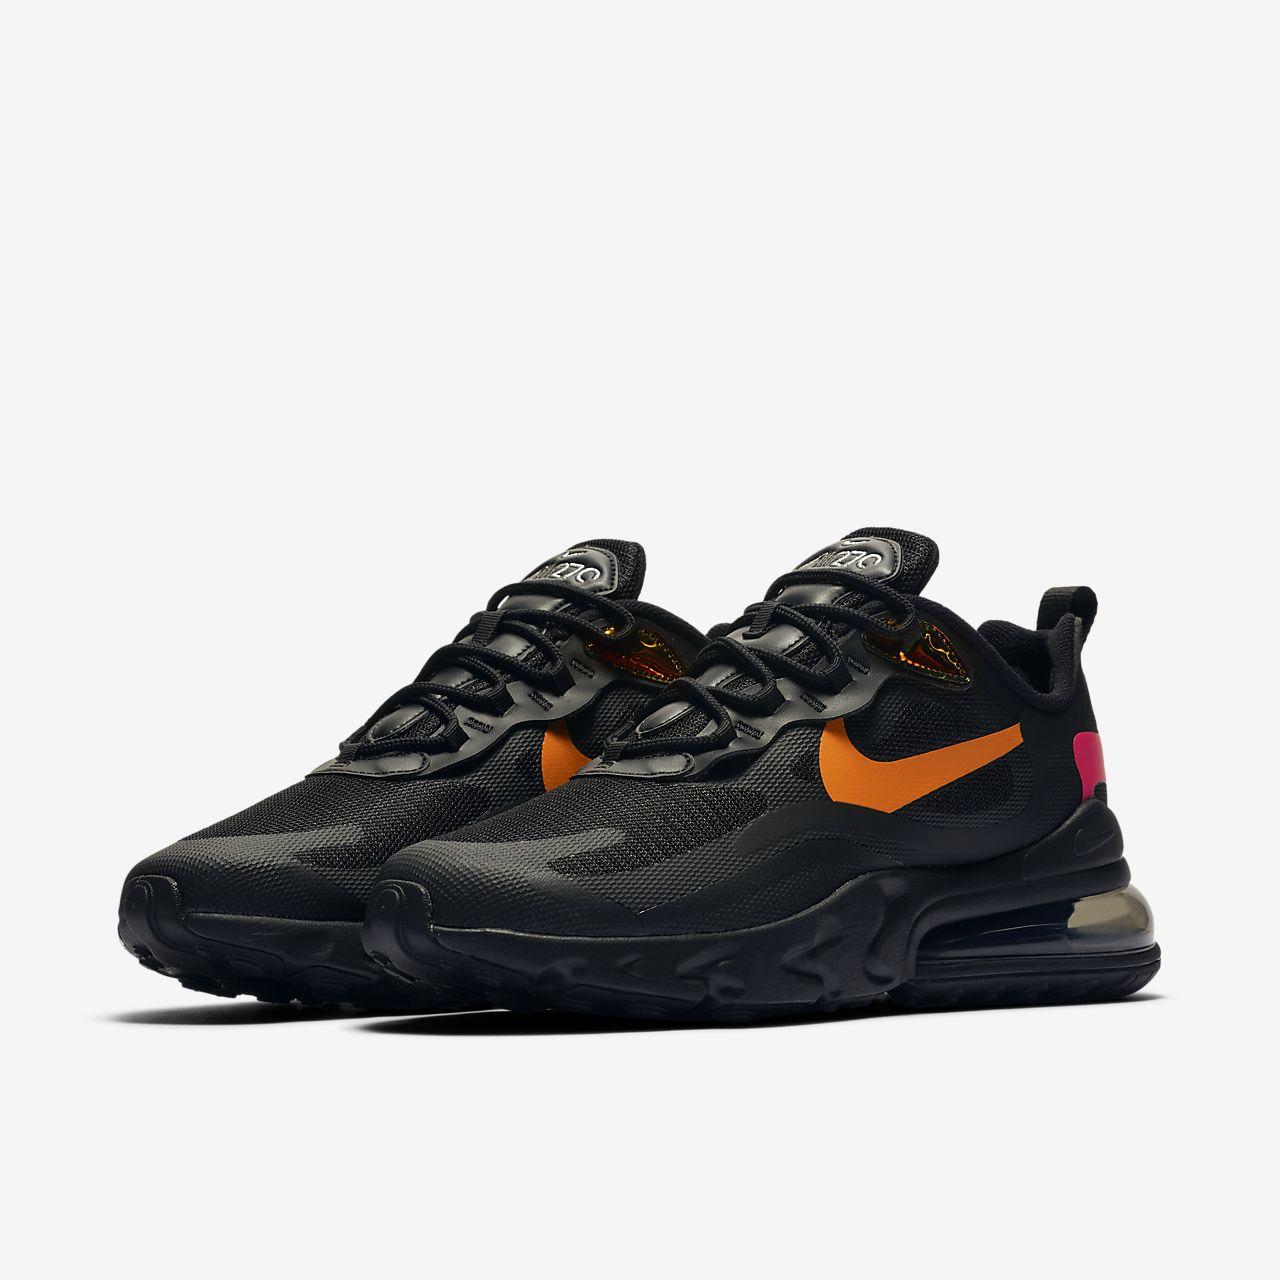 nike junior air max 270 react trainer black / orange / grey